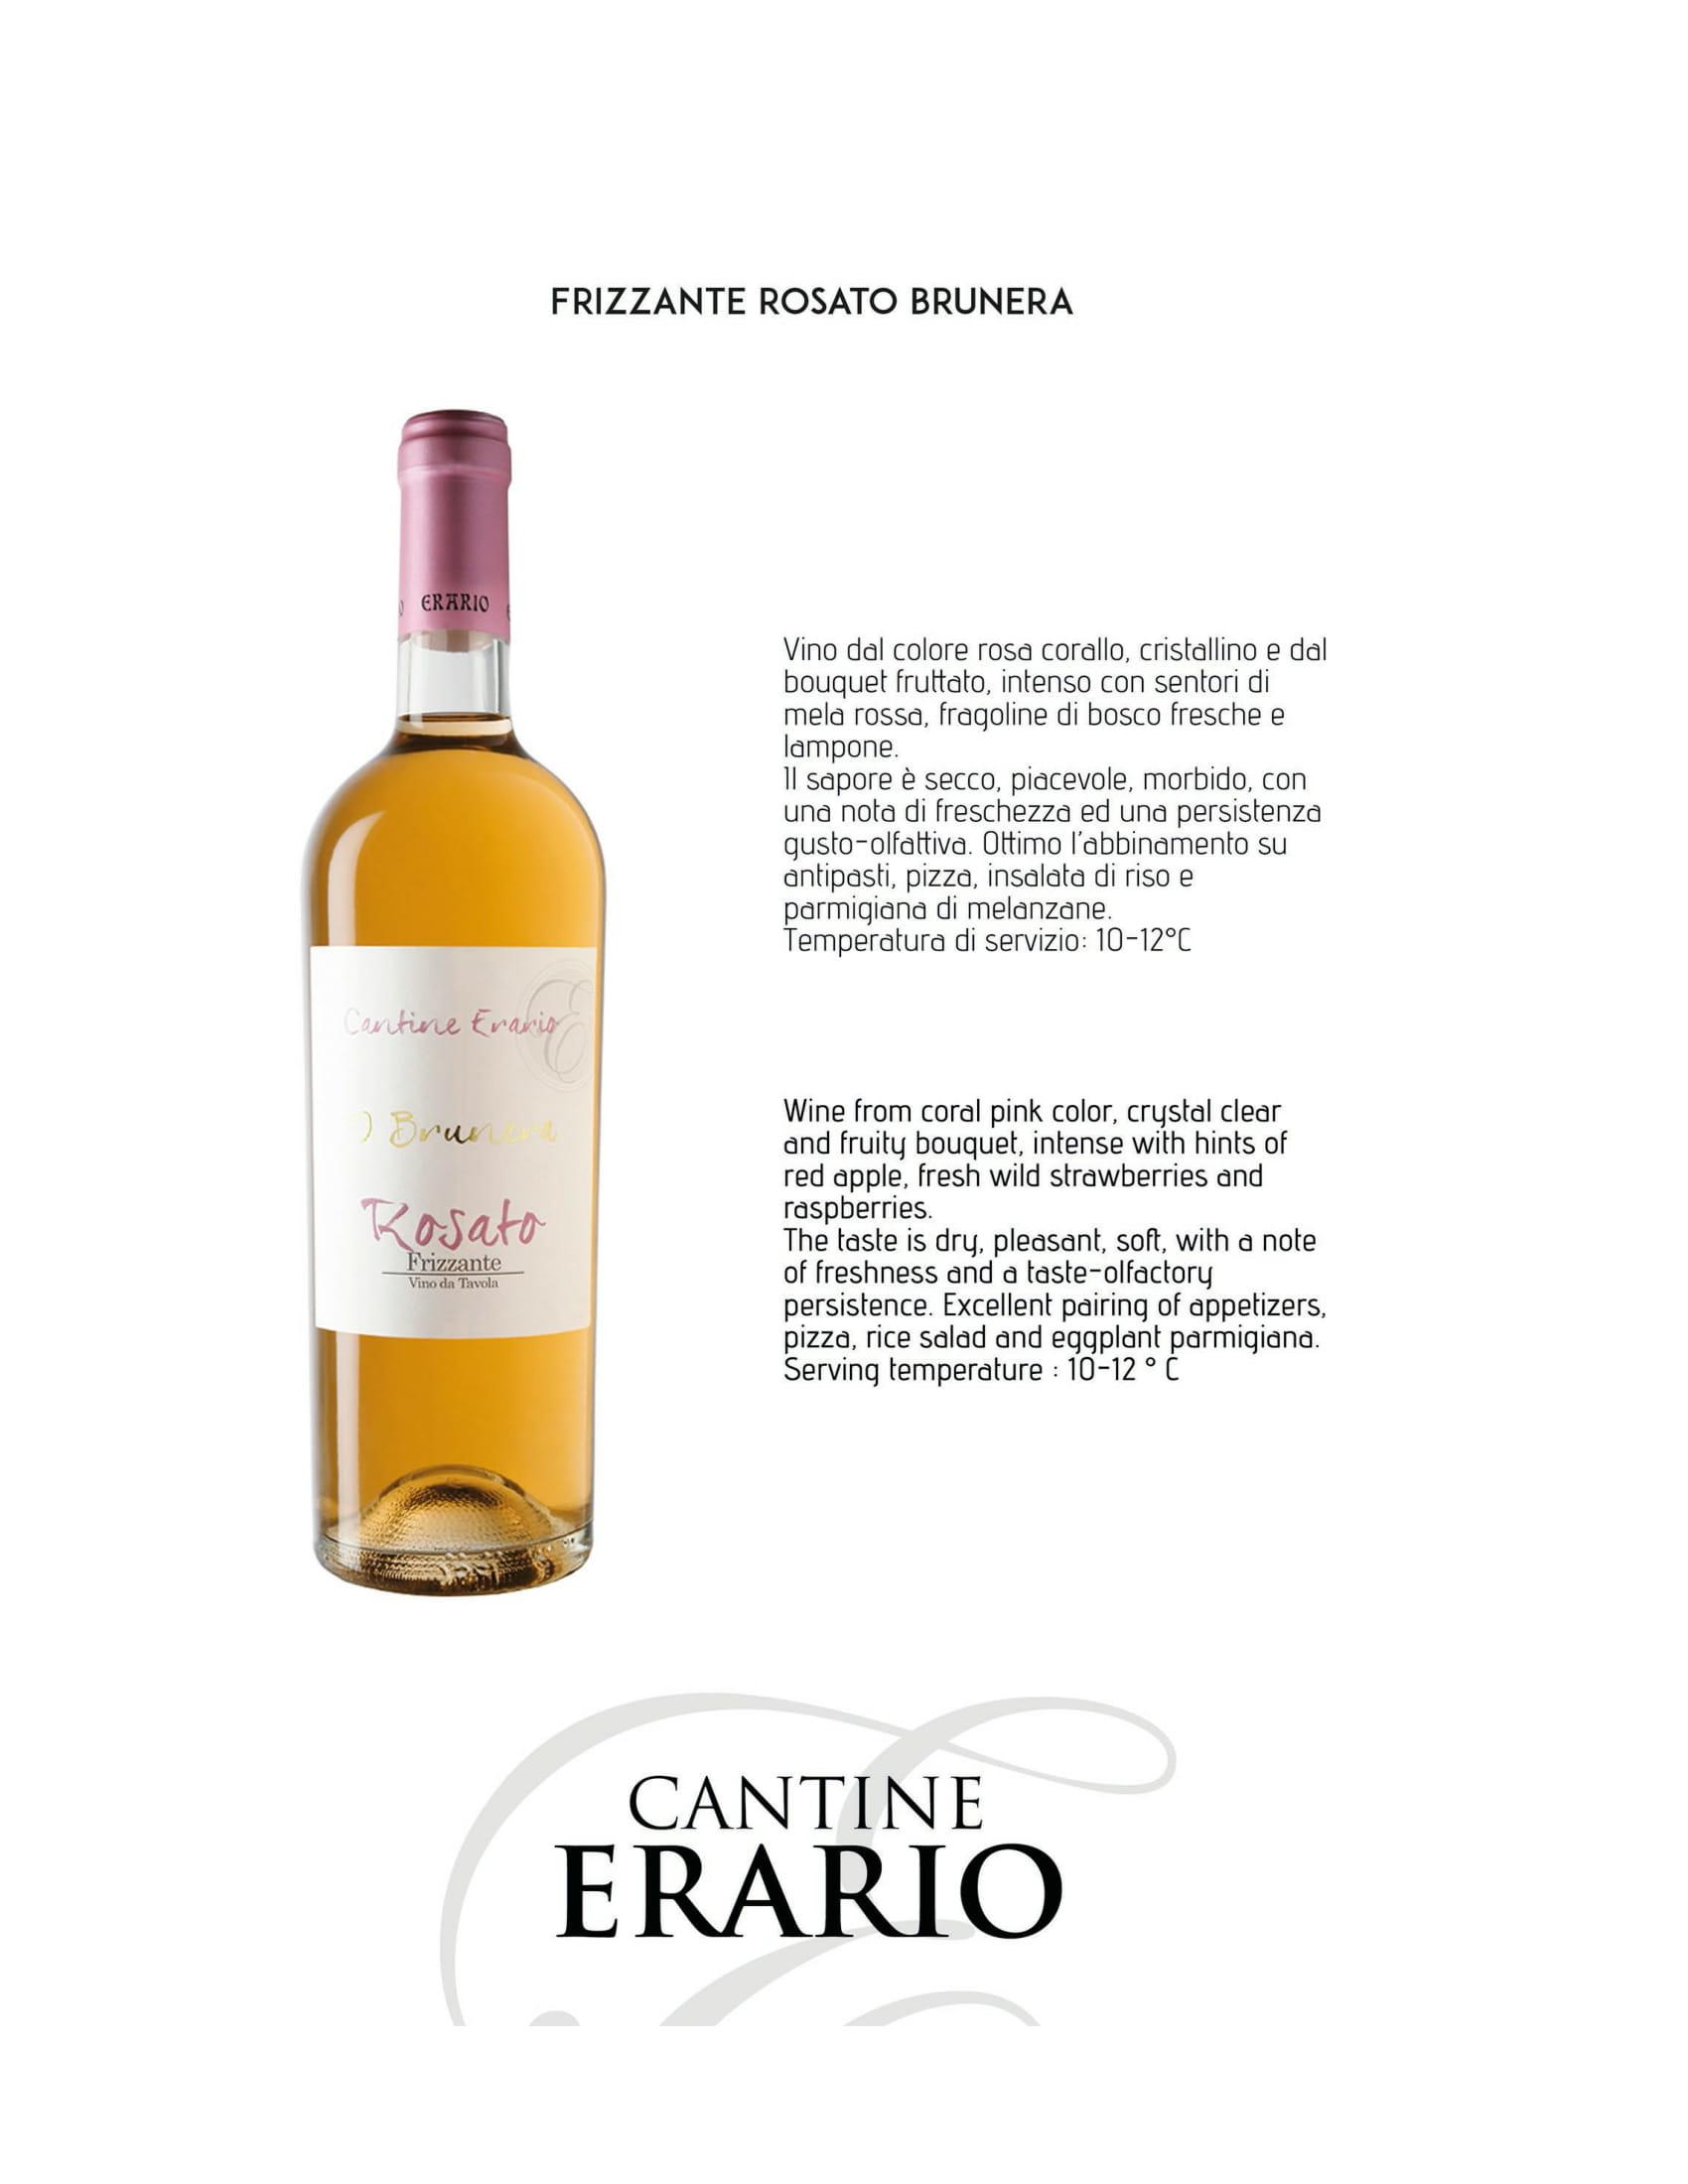 erario vino frizzante rosato-1jpg